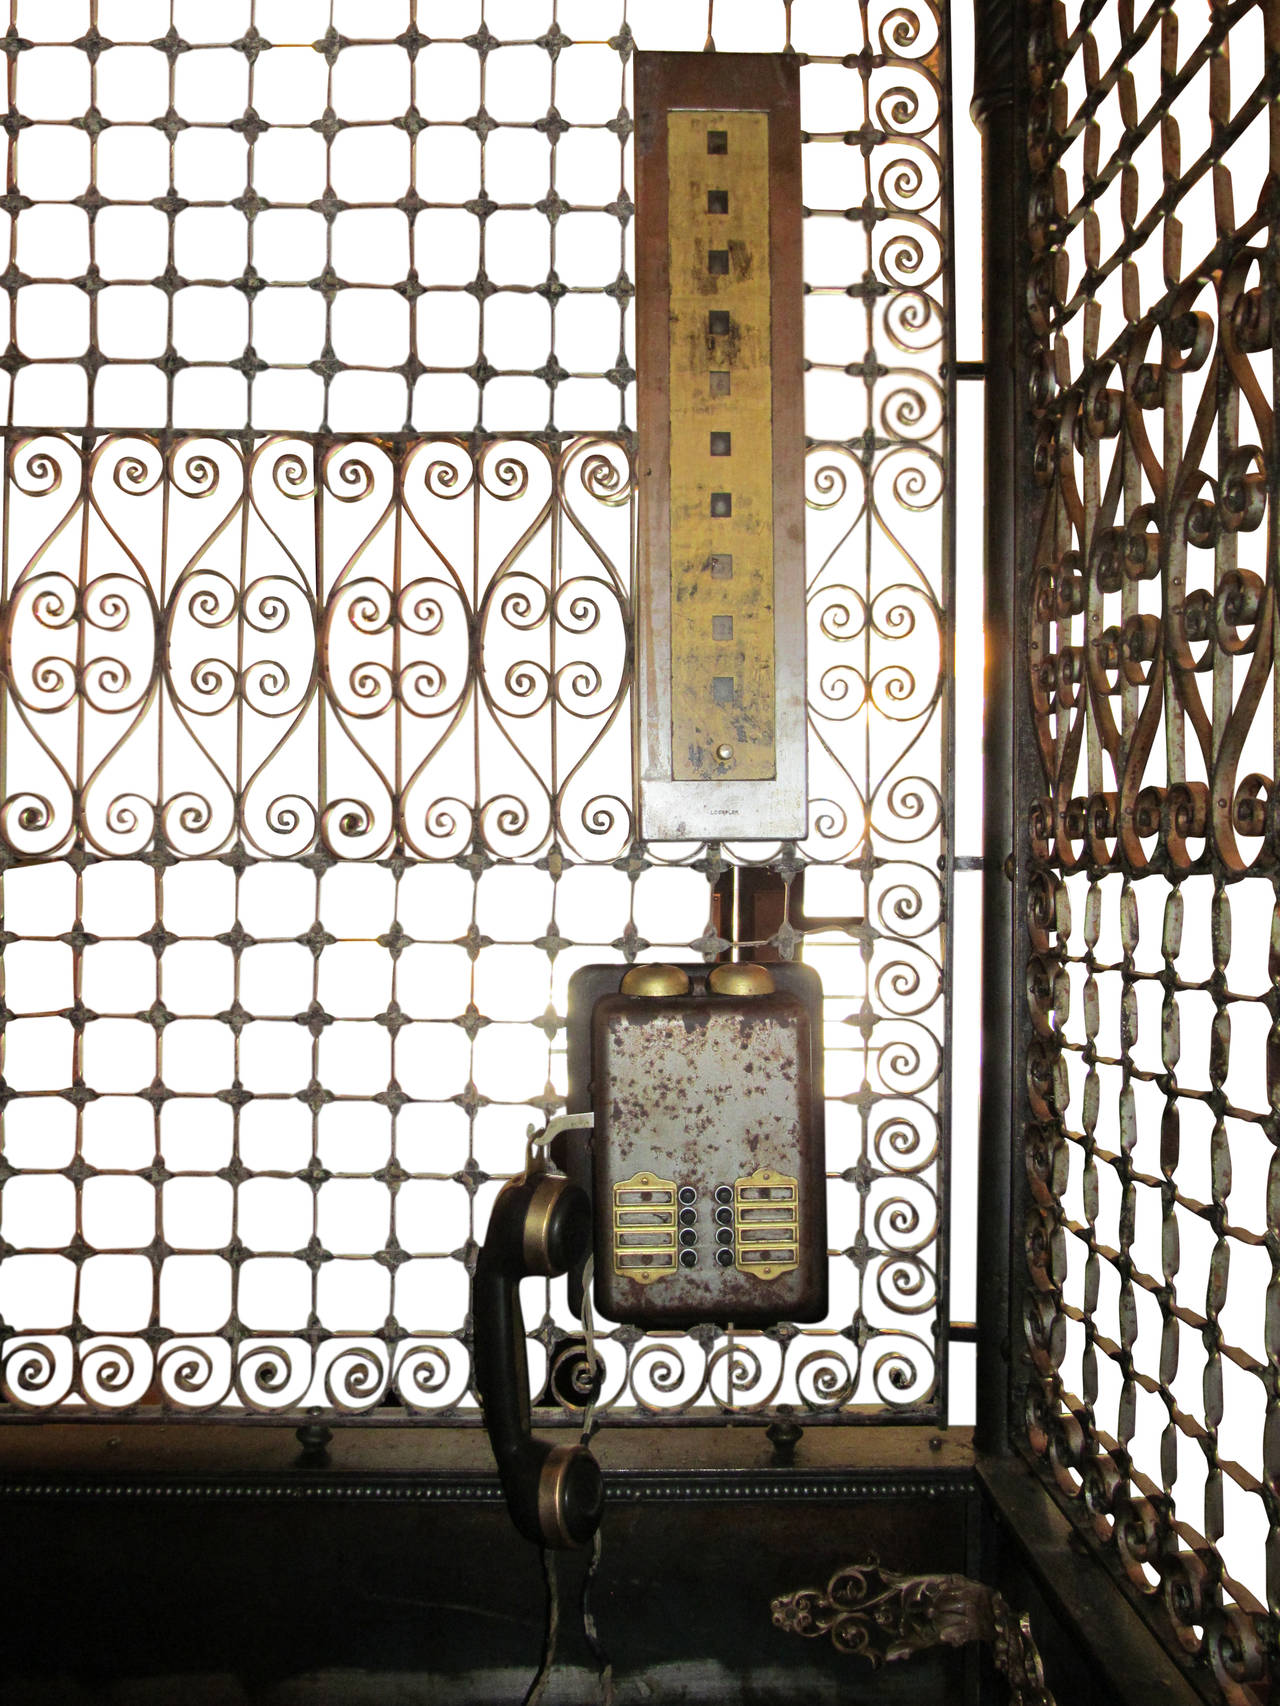 Antique Otis Birdcage Elevator With Original Hardware